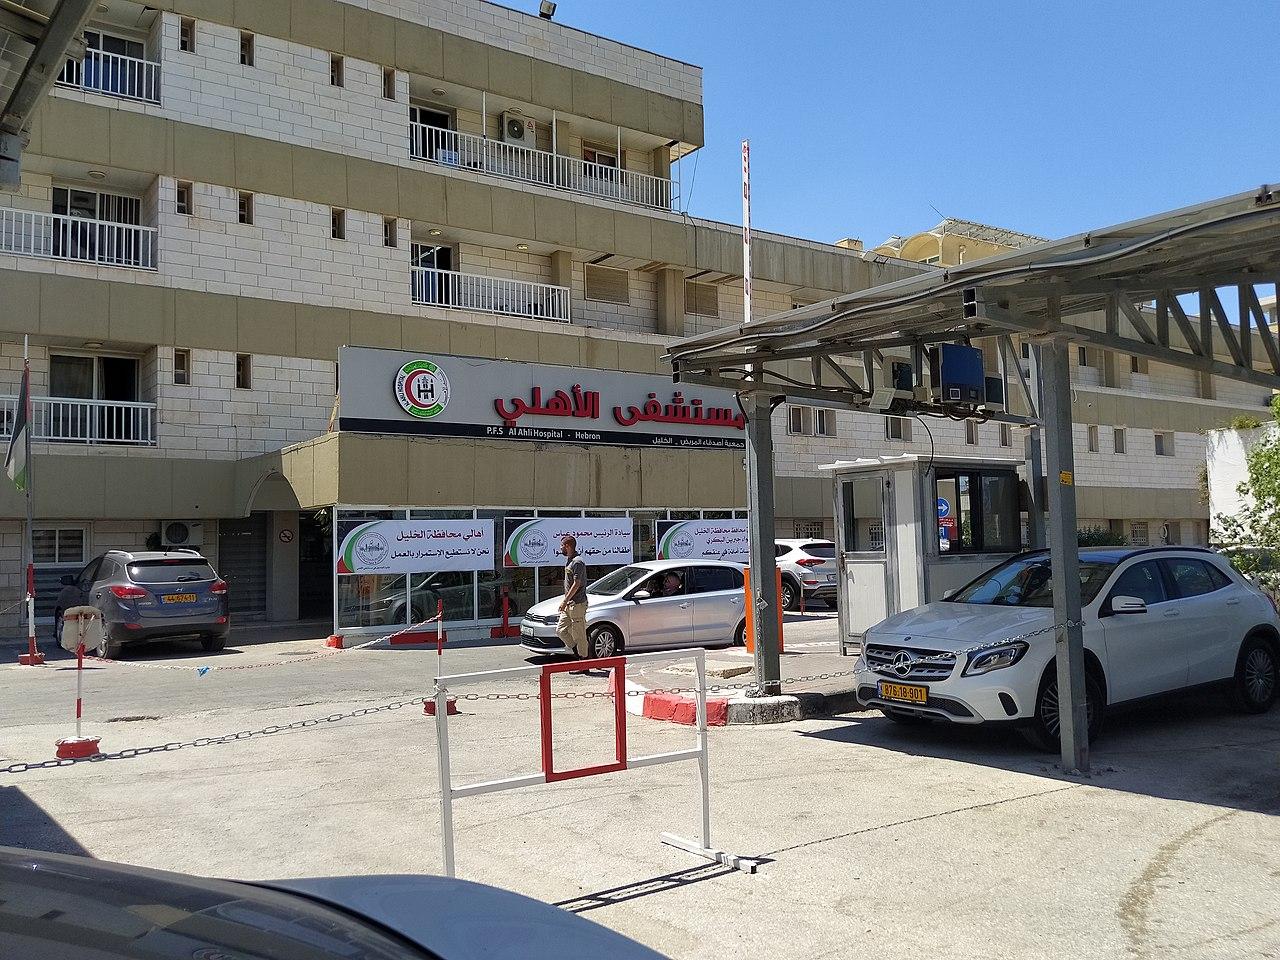 Al-Ahli Hospital in Hebron, Aug. 17, 2020. (Amin/Wikimedia/CC-BY-SA-4.0)